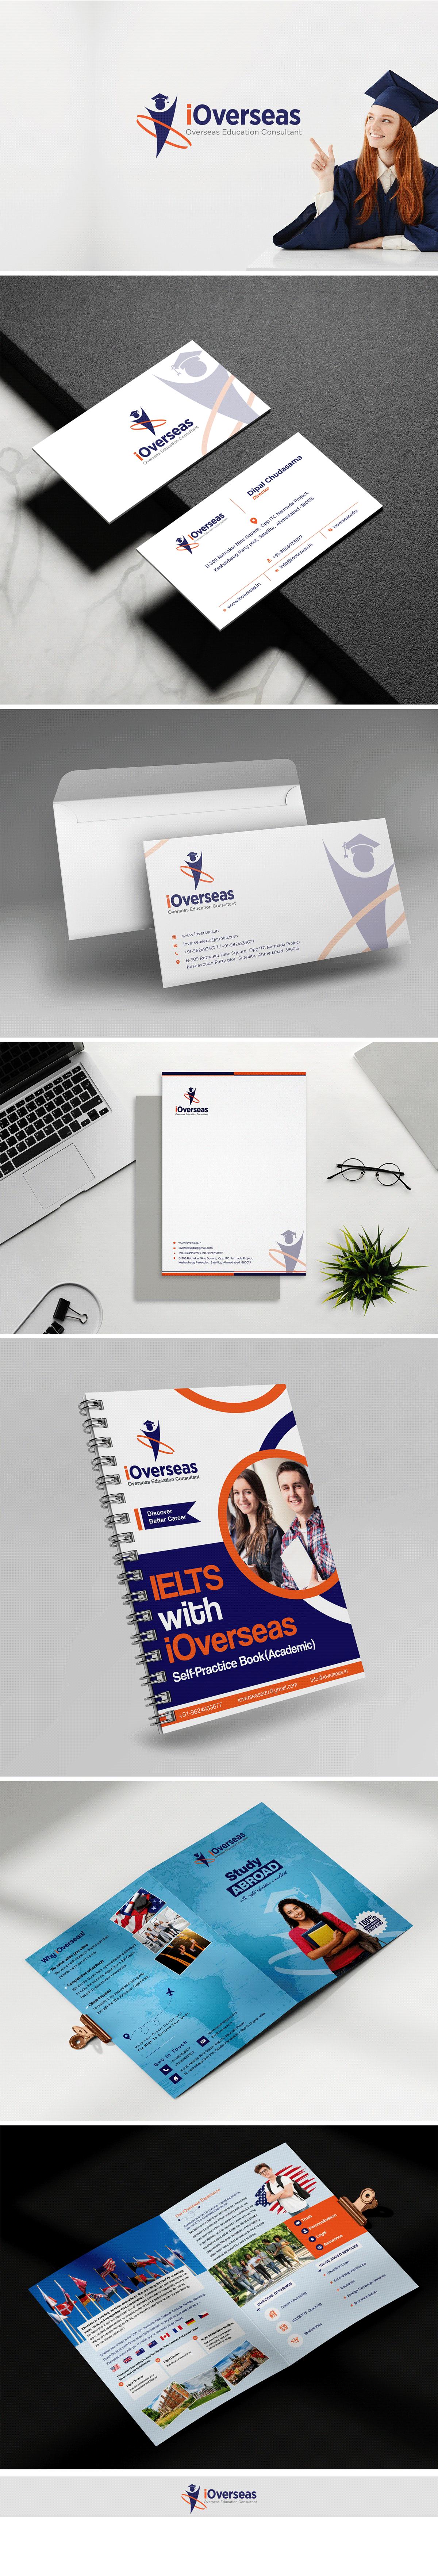 brochure design photoshop stationery design